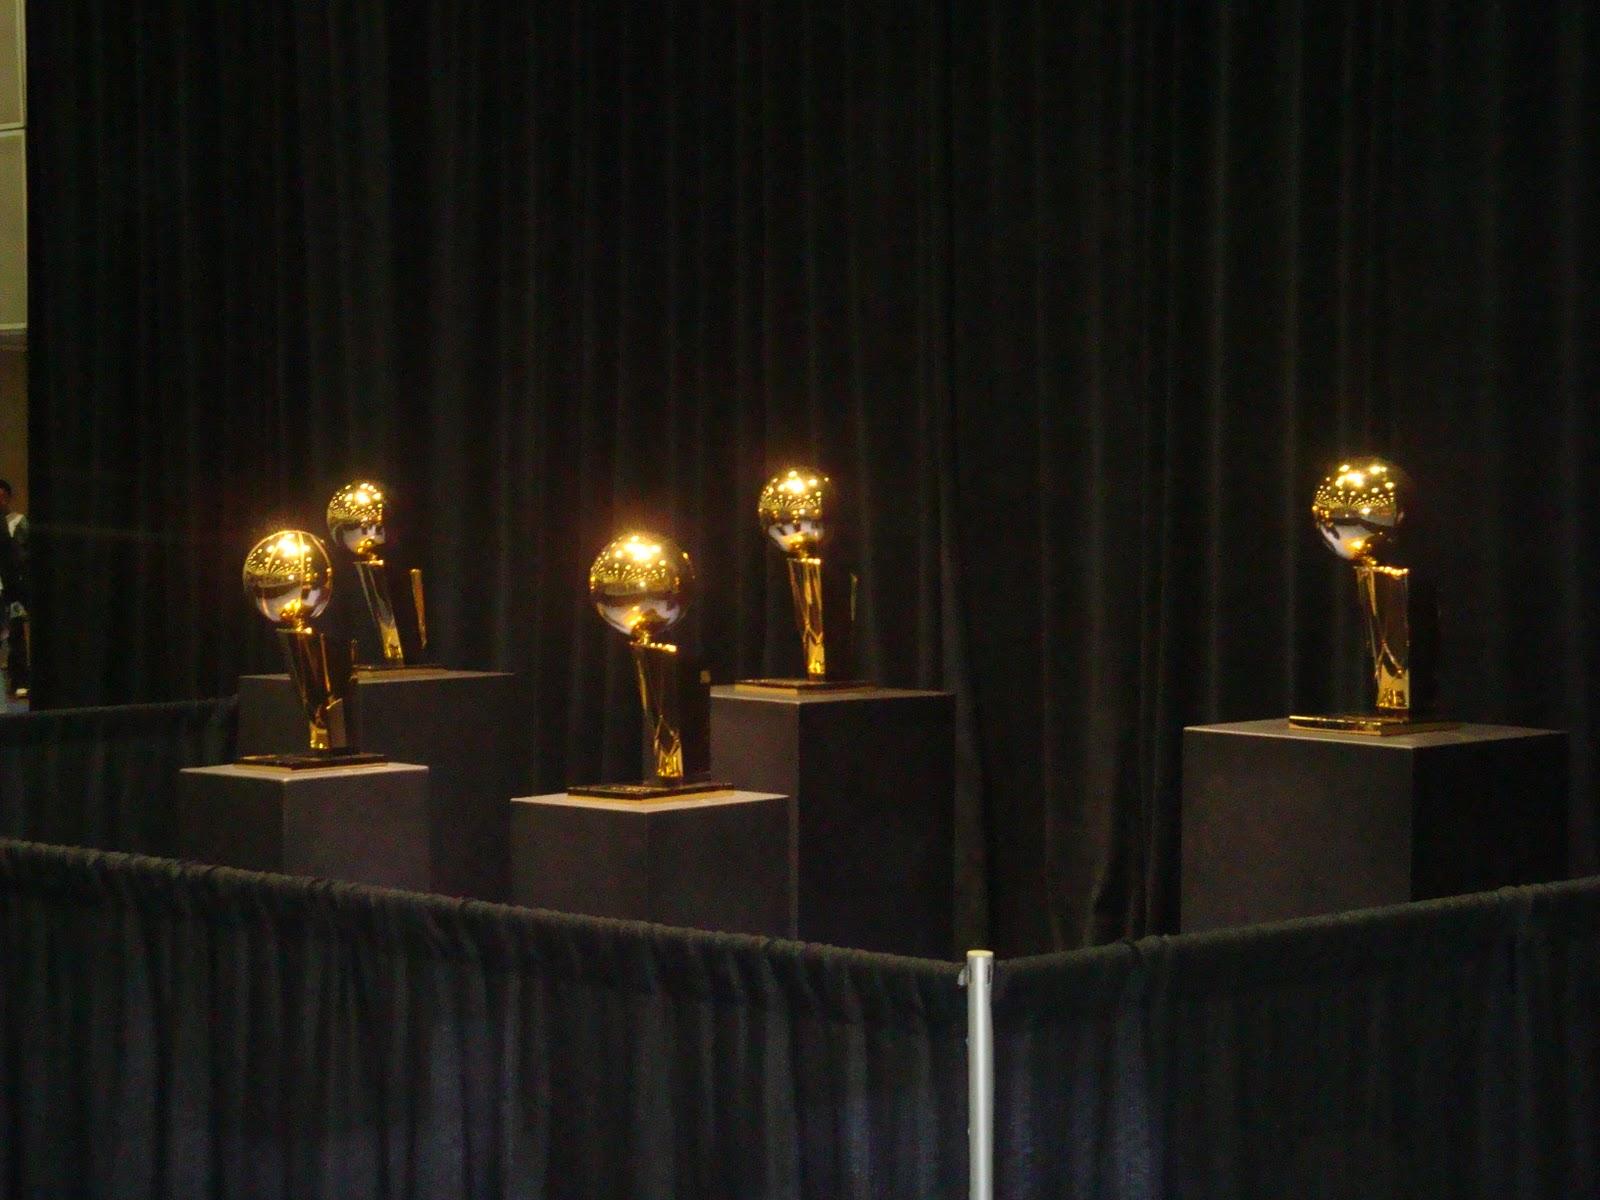 Los Angeles Lakers Wallpaper Hd Gt Nba Jam Session Part 3 Losangelesinspiration